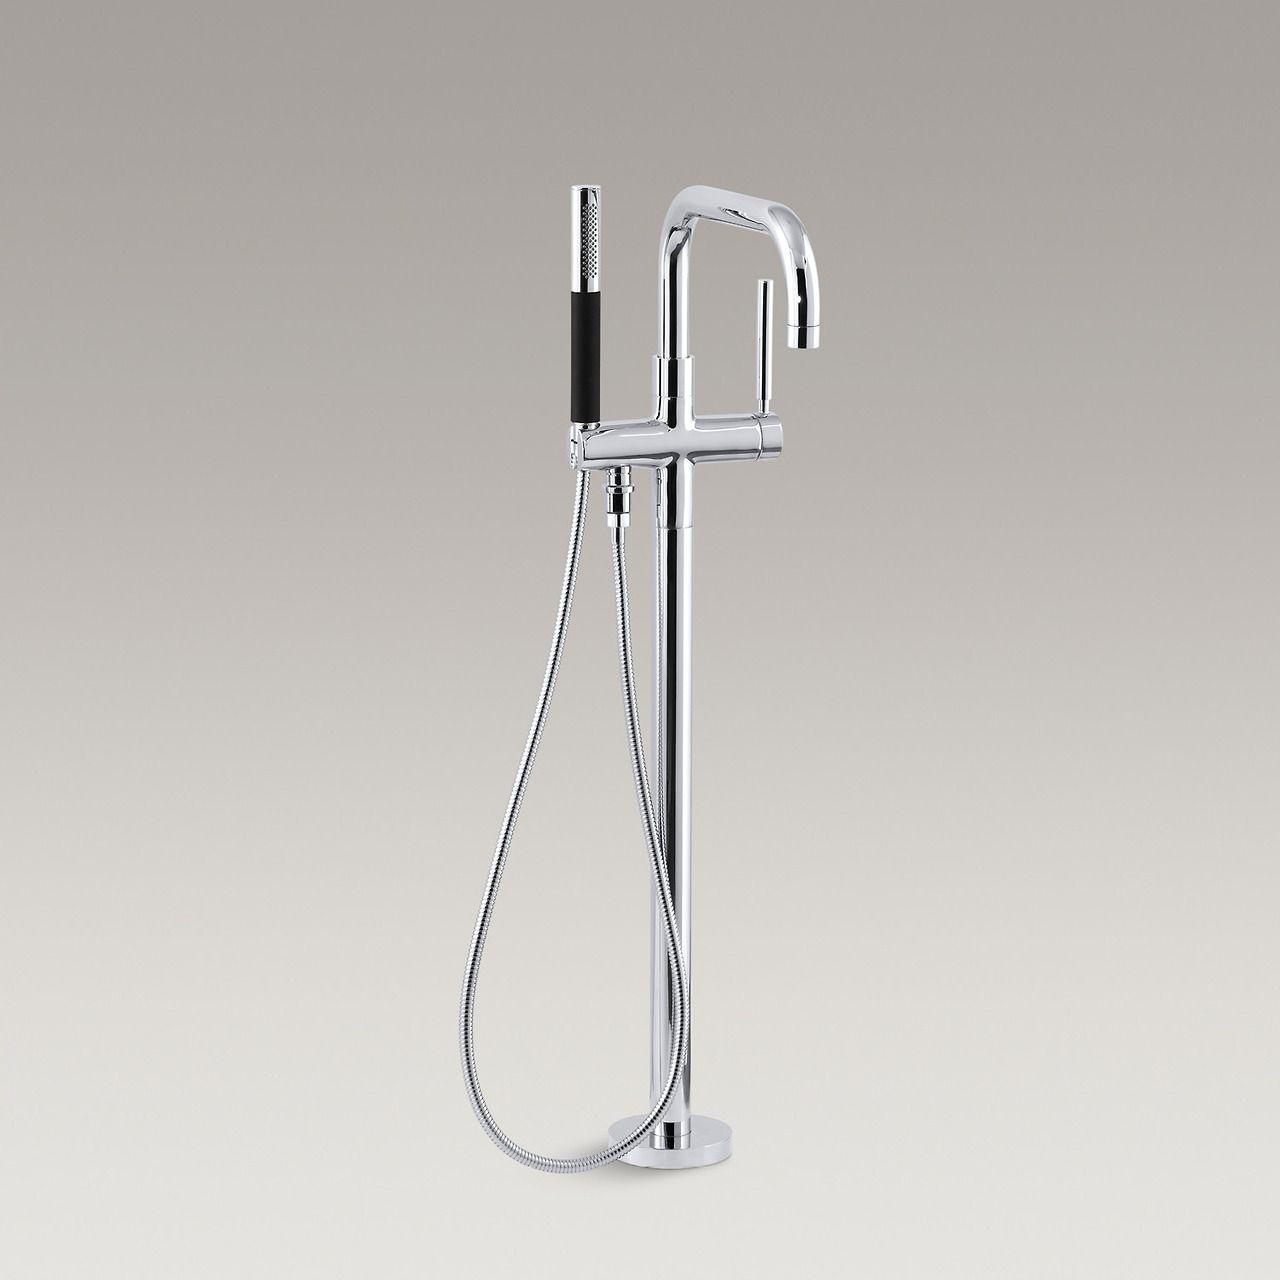 Purist bath filler http://www.us.kohler.com/us/Purist-floor-mount ...